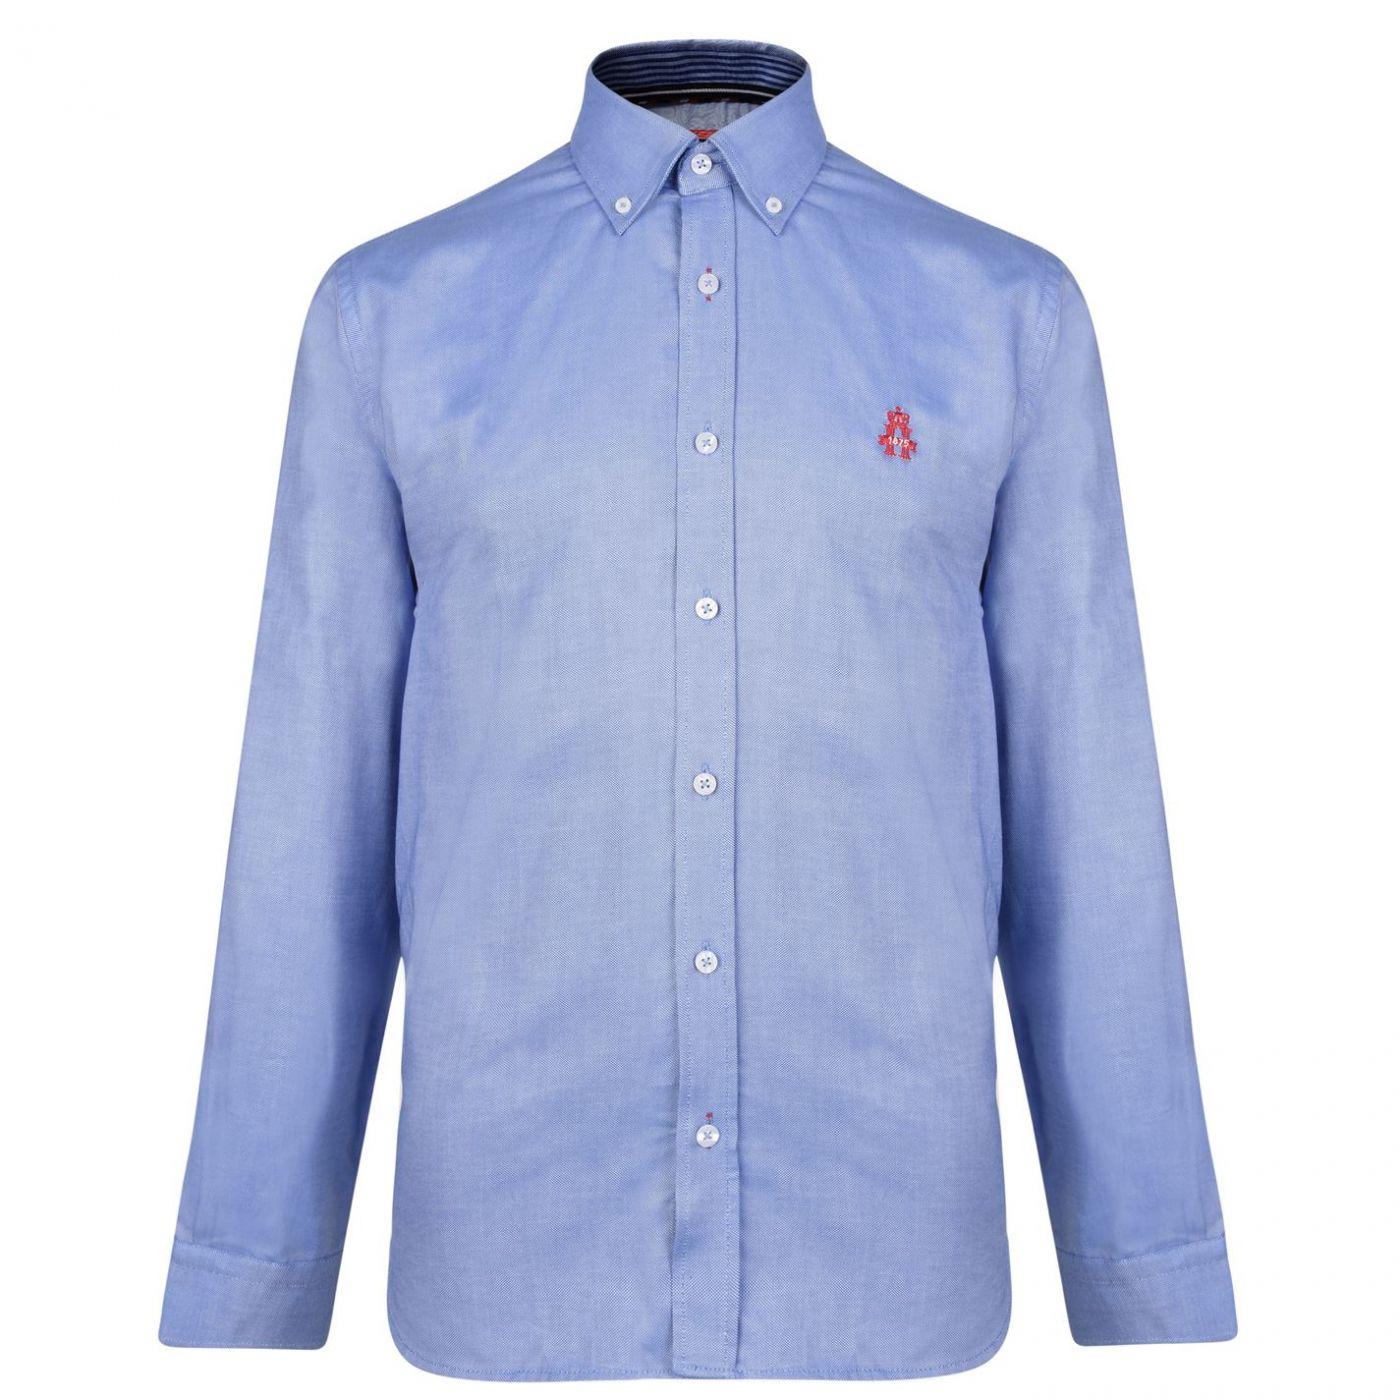 Hurlingham Polo 1875 Royal Oxford Long Sleeved Shirt